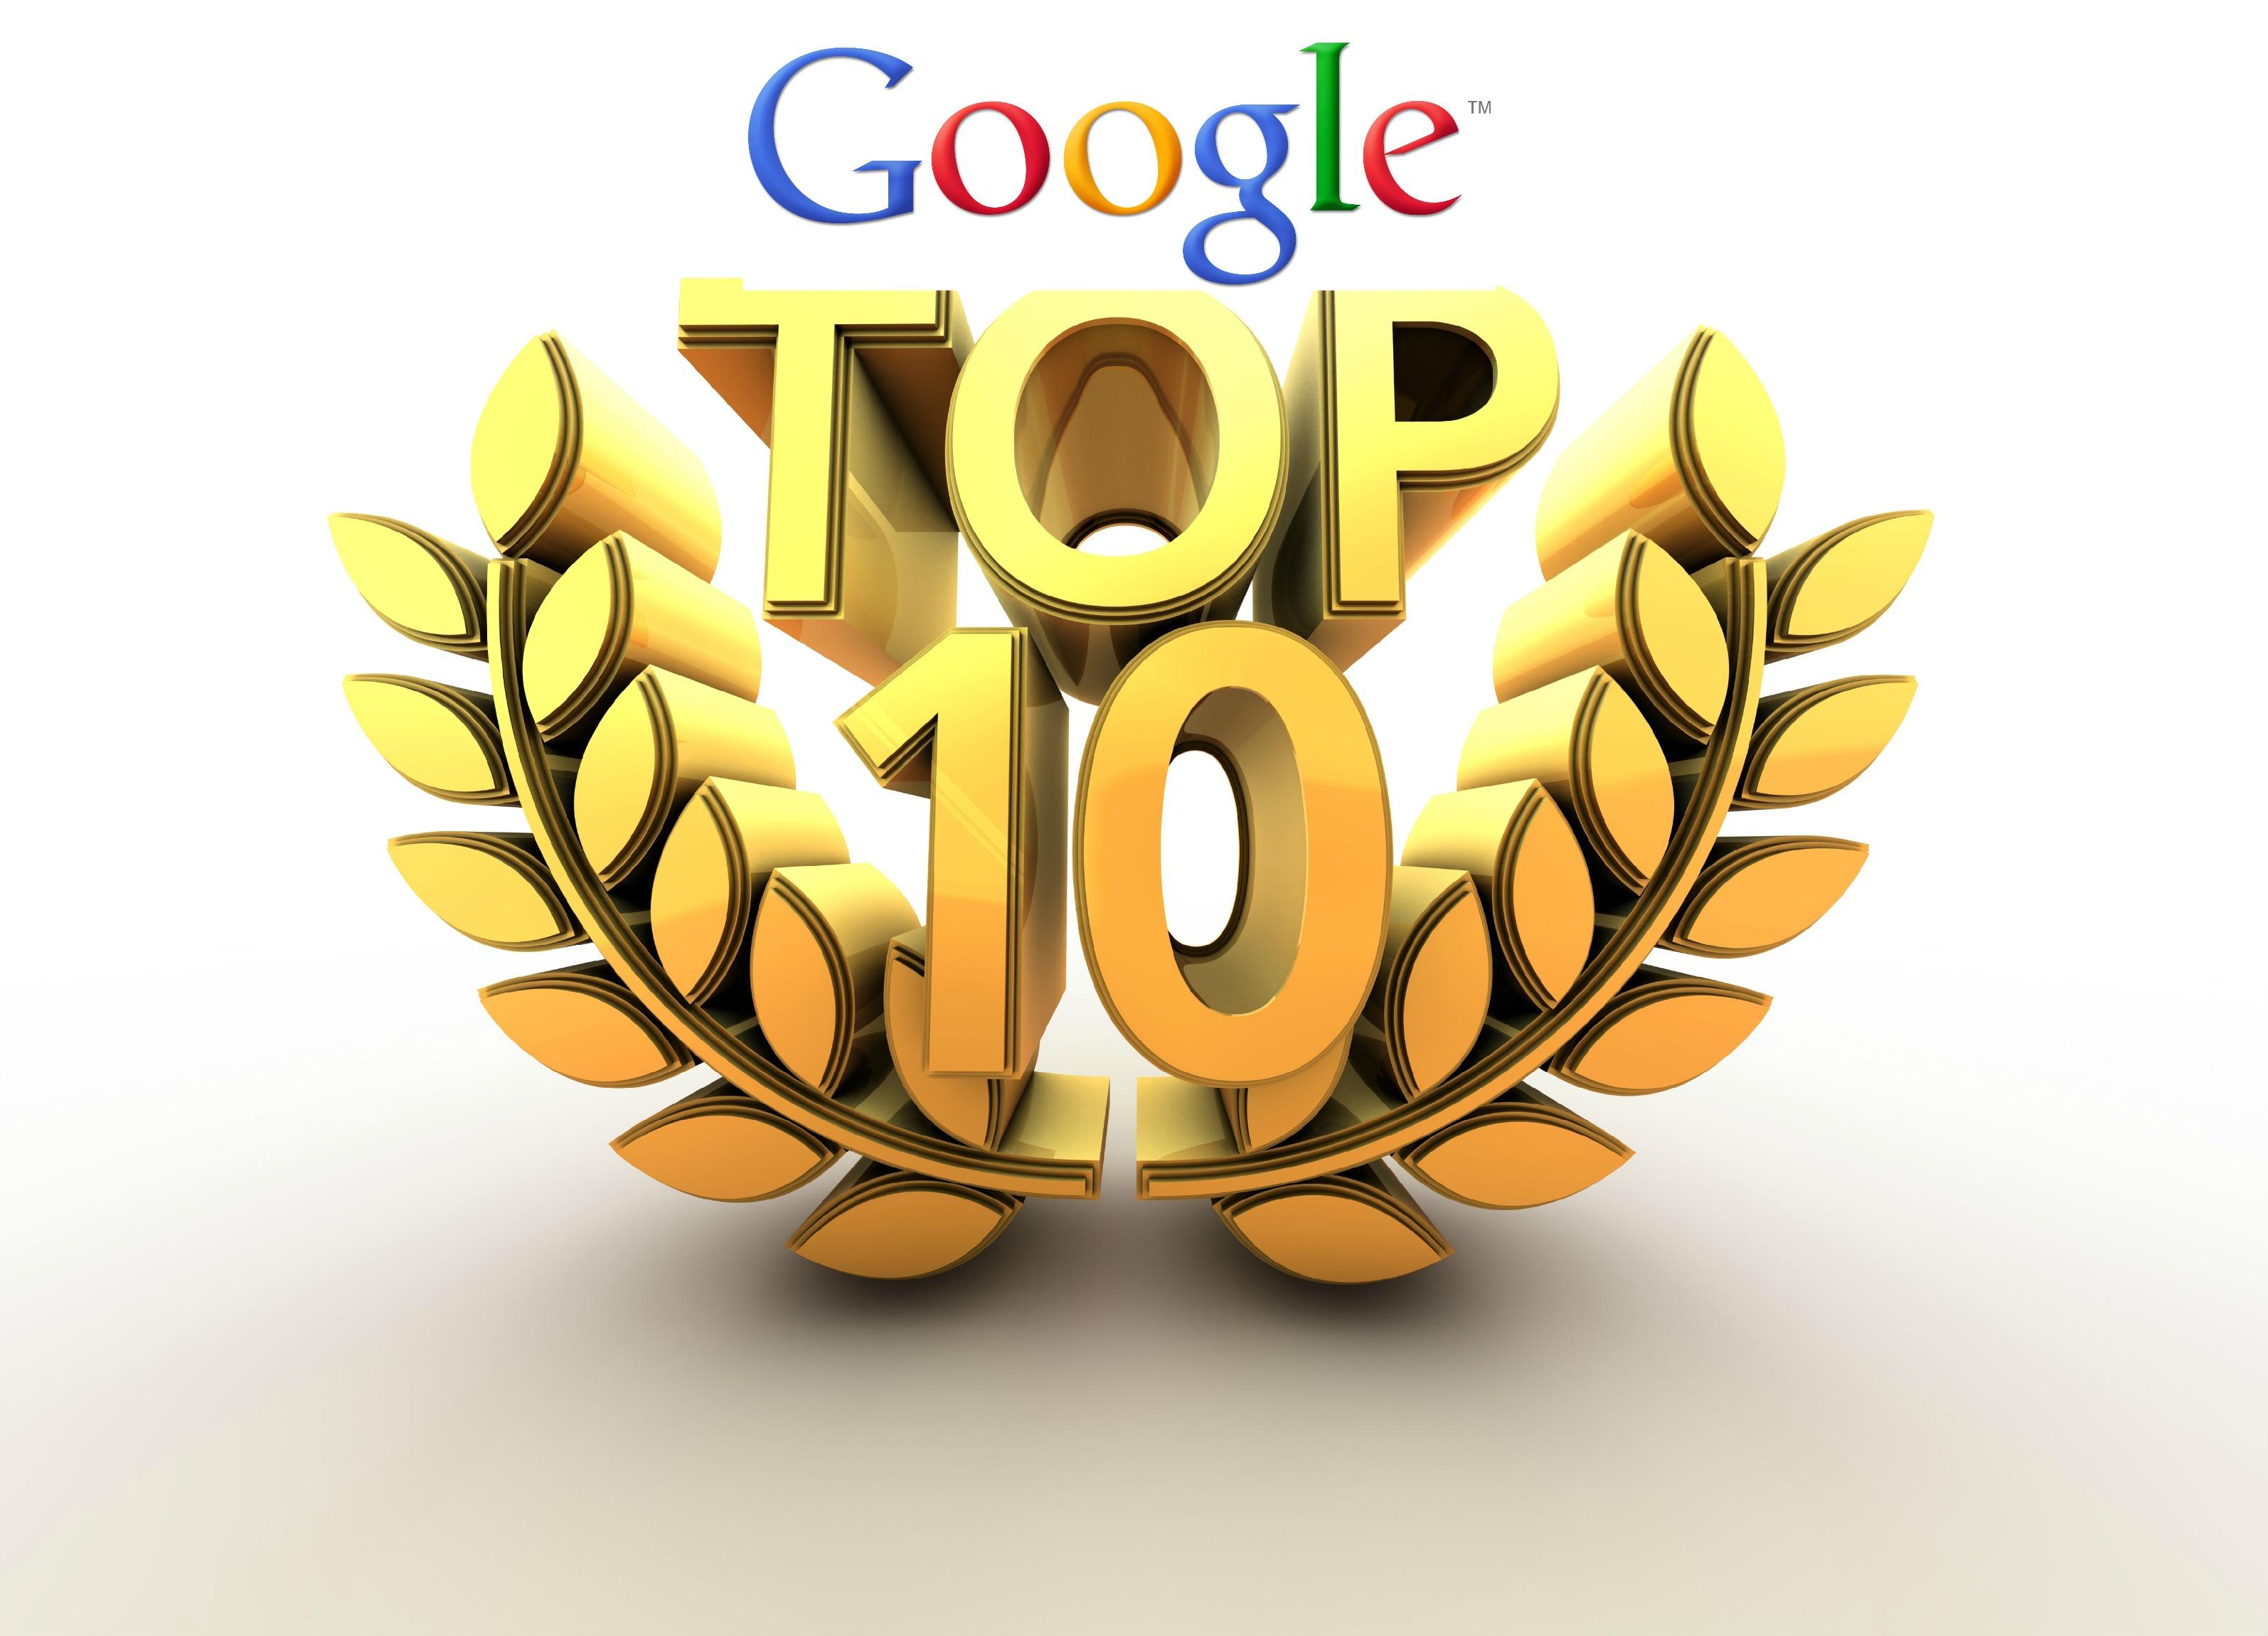 top 10 de google